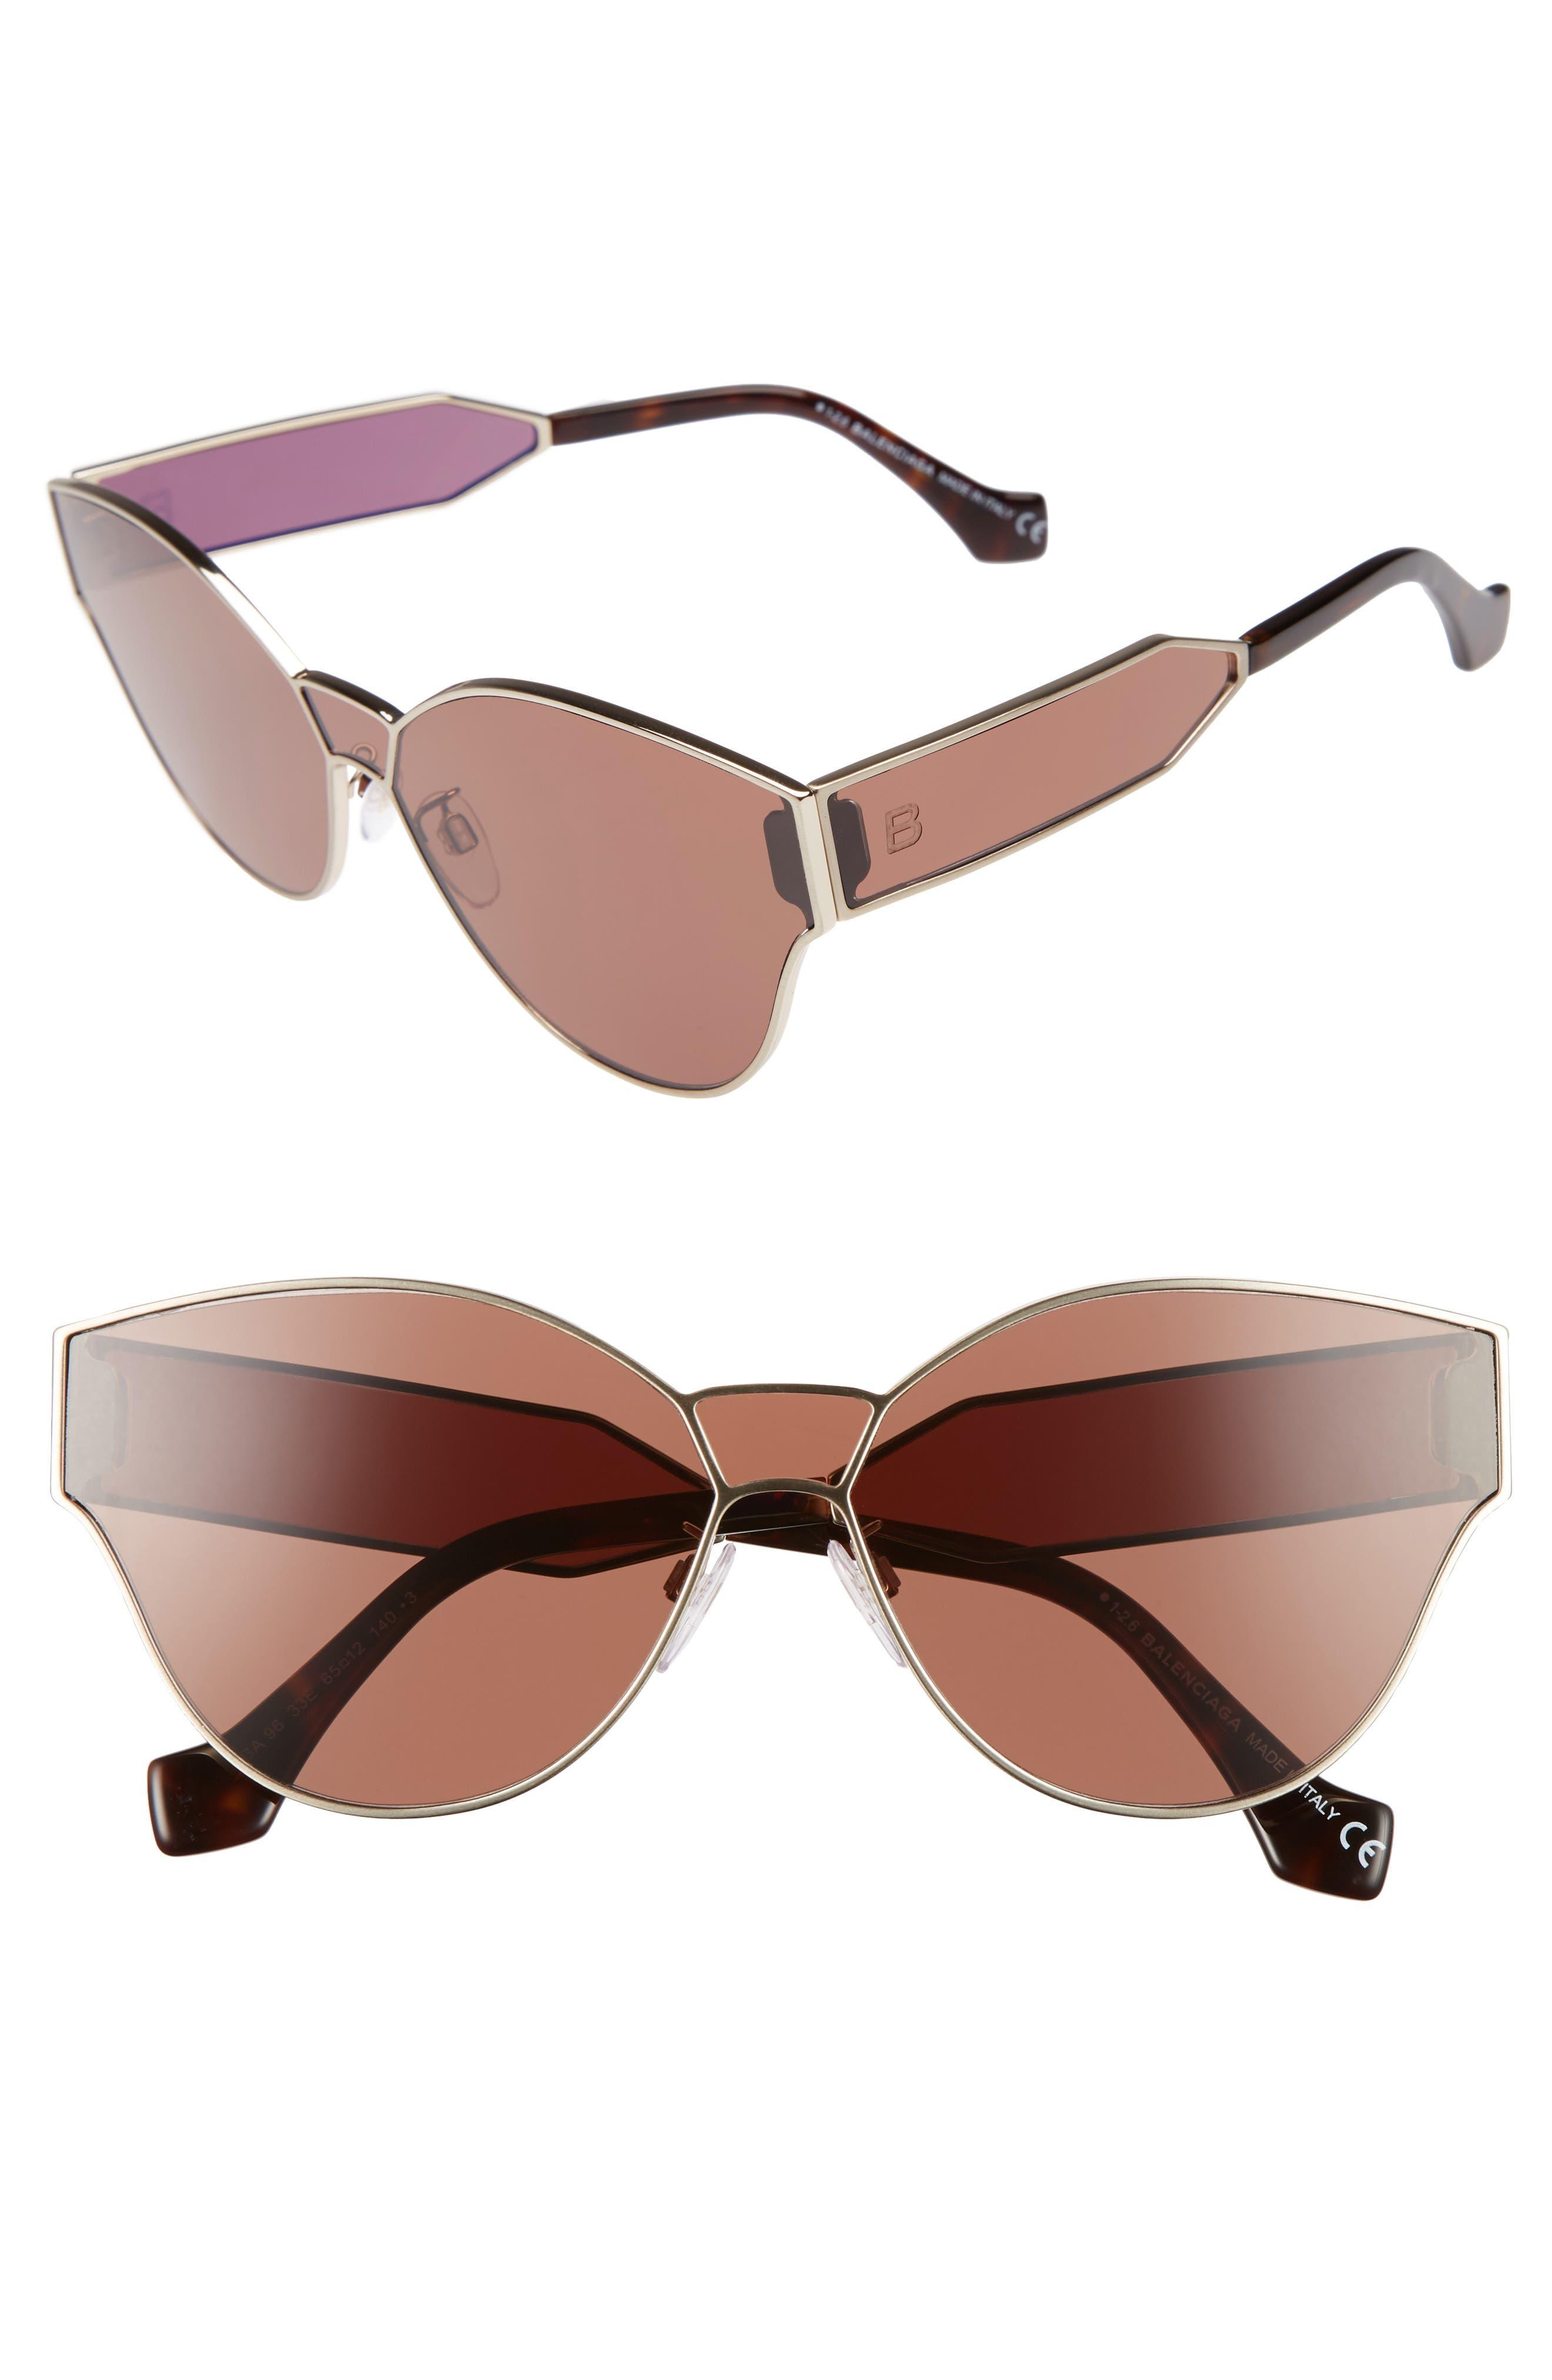 Balenciaga 65mm Sunglasses